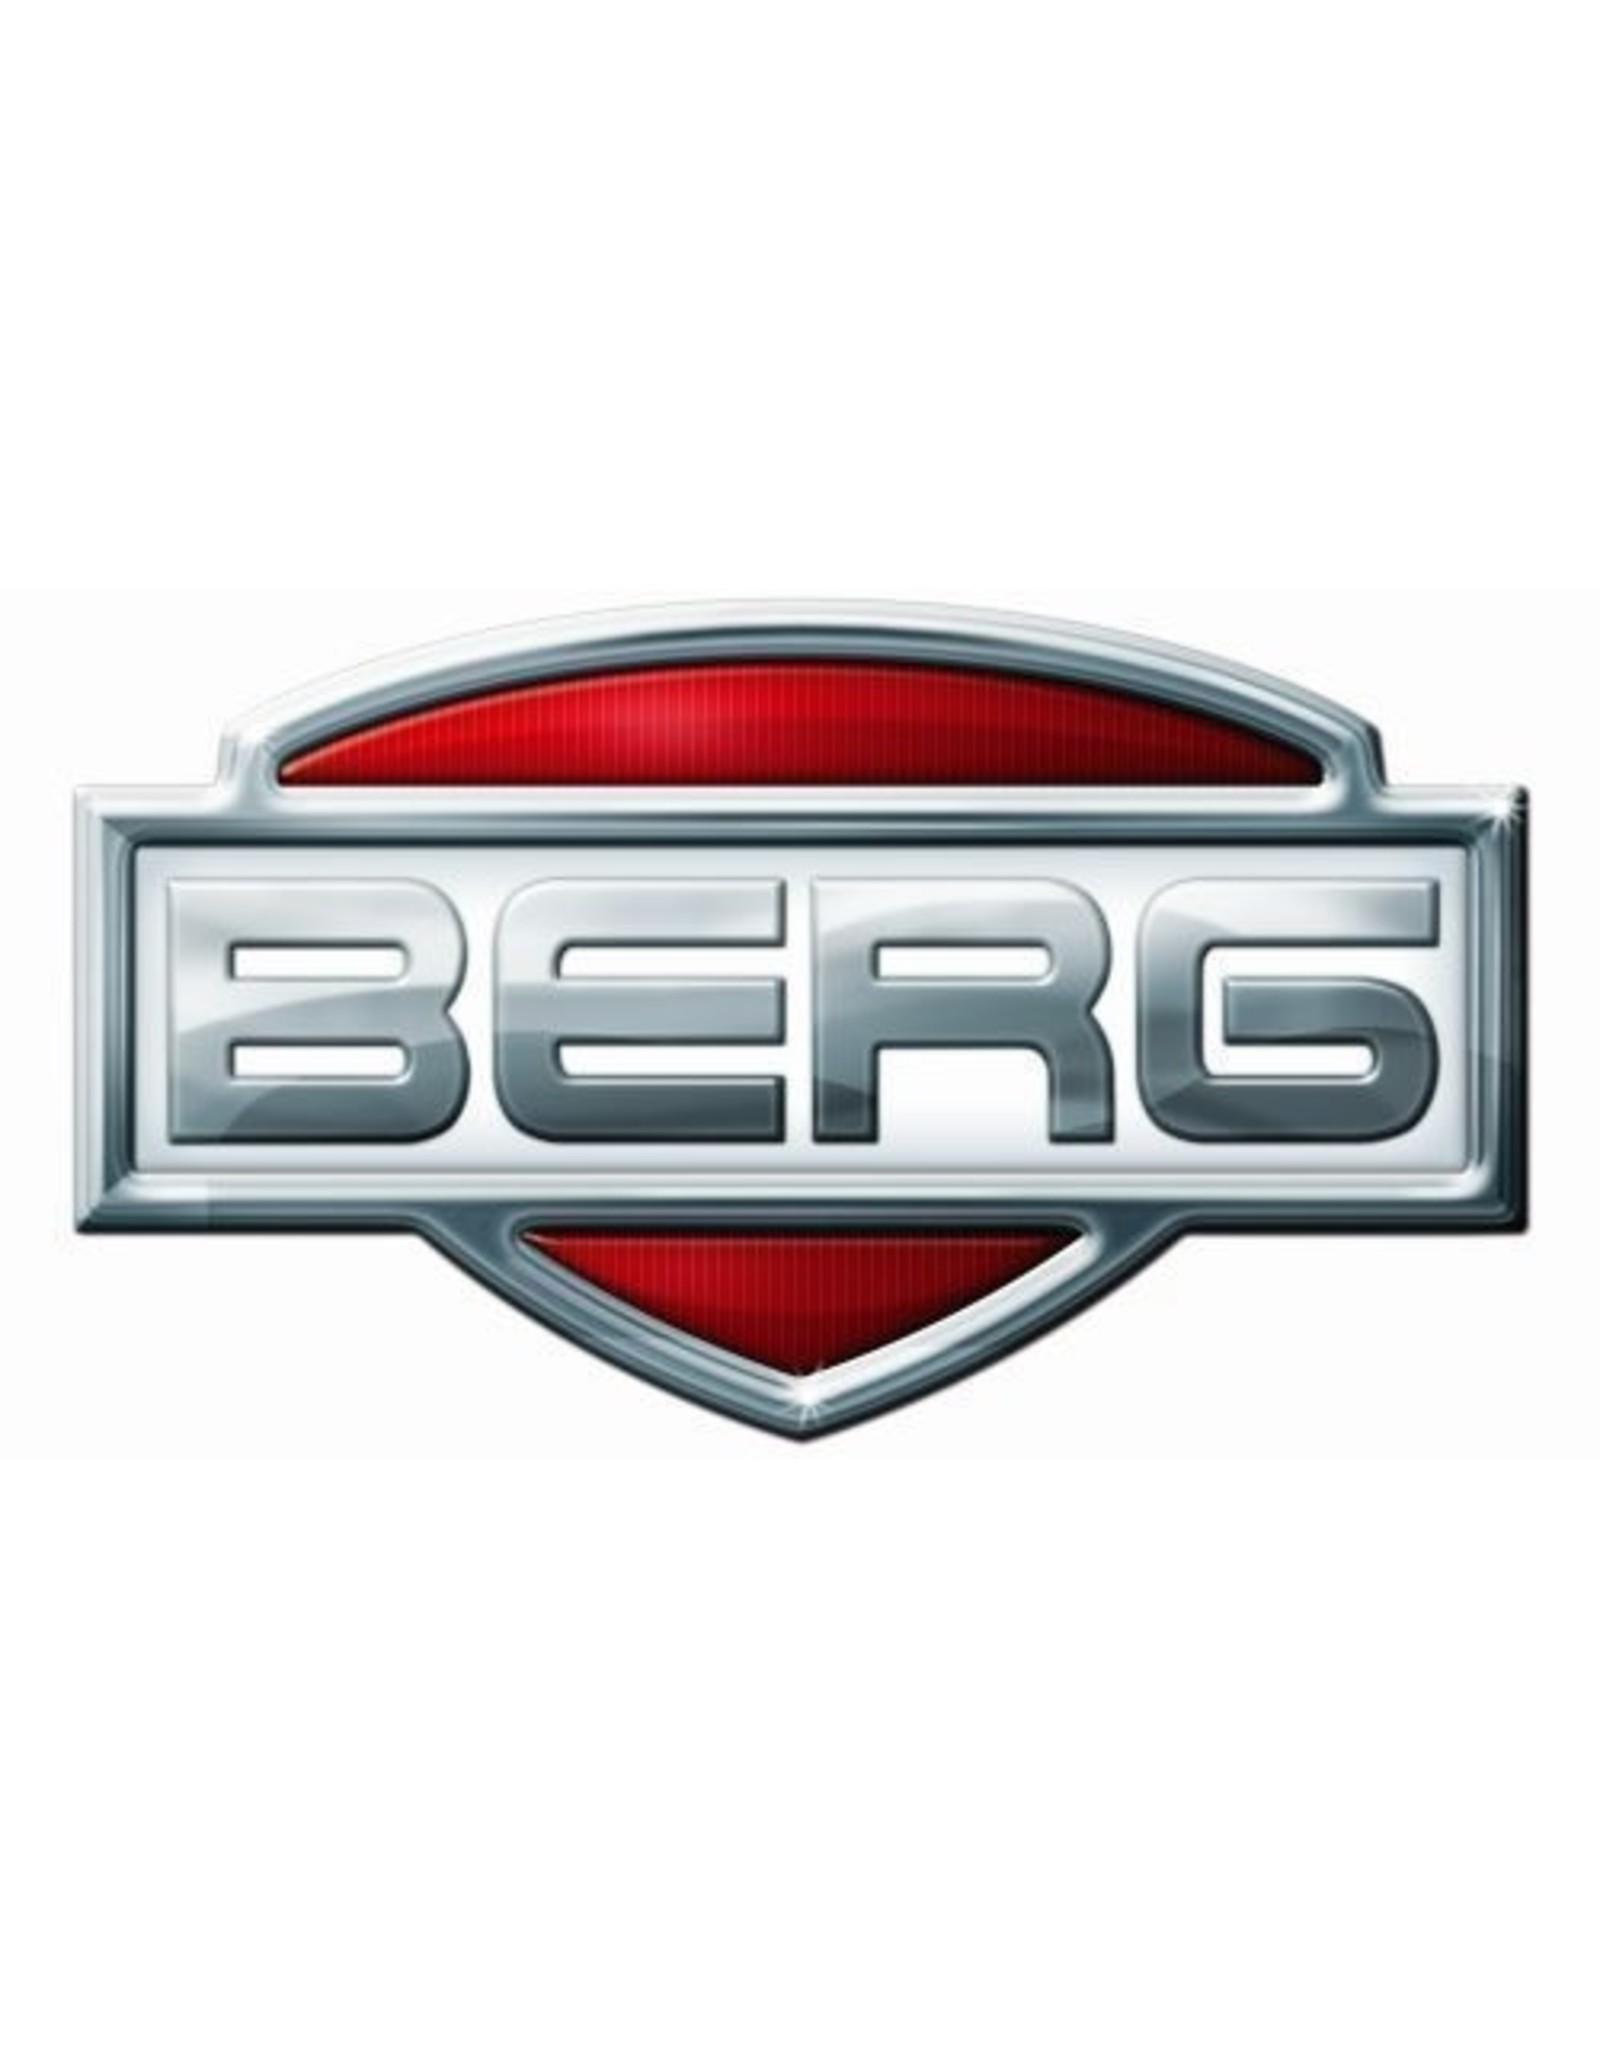 BERG BERG Buddy Rad schwarz 12.5x2.25-8 Slick (mit Streifen)